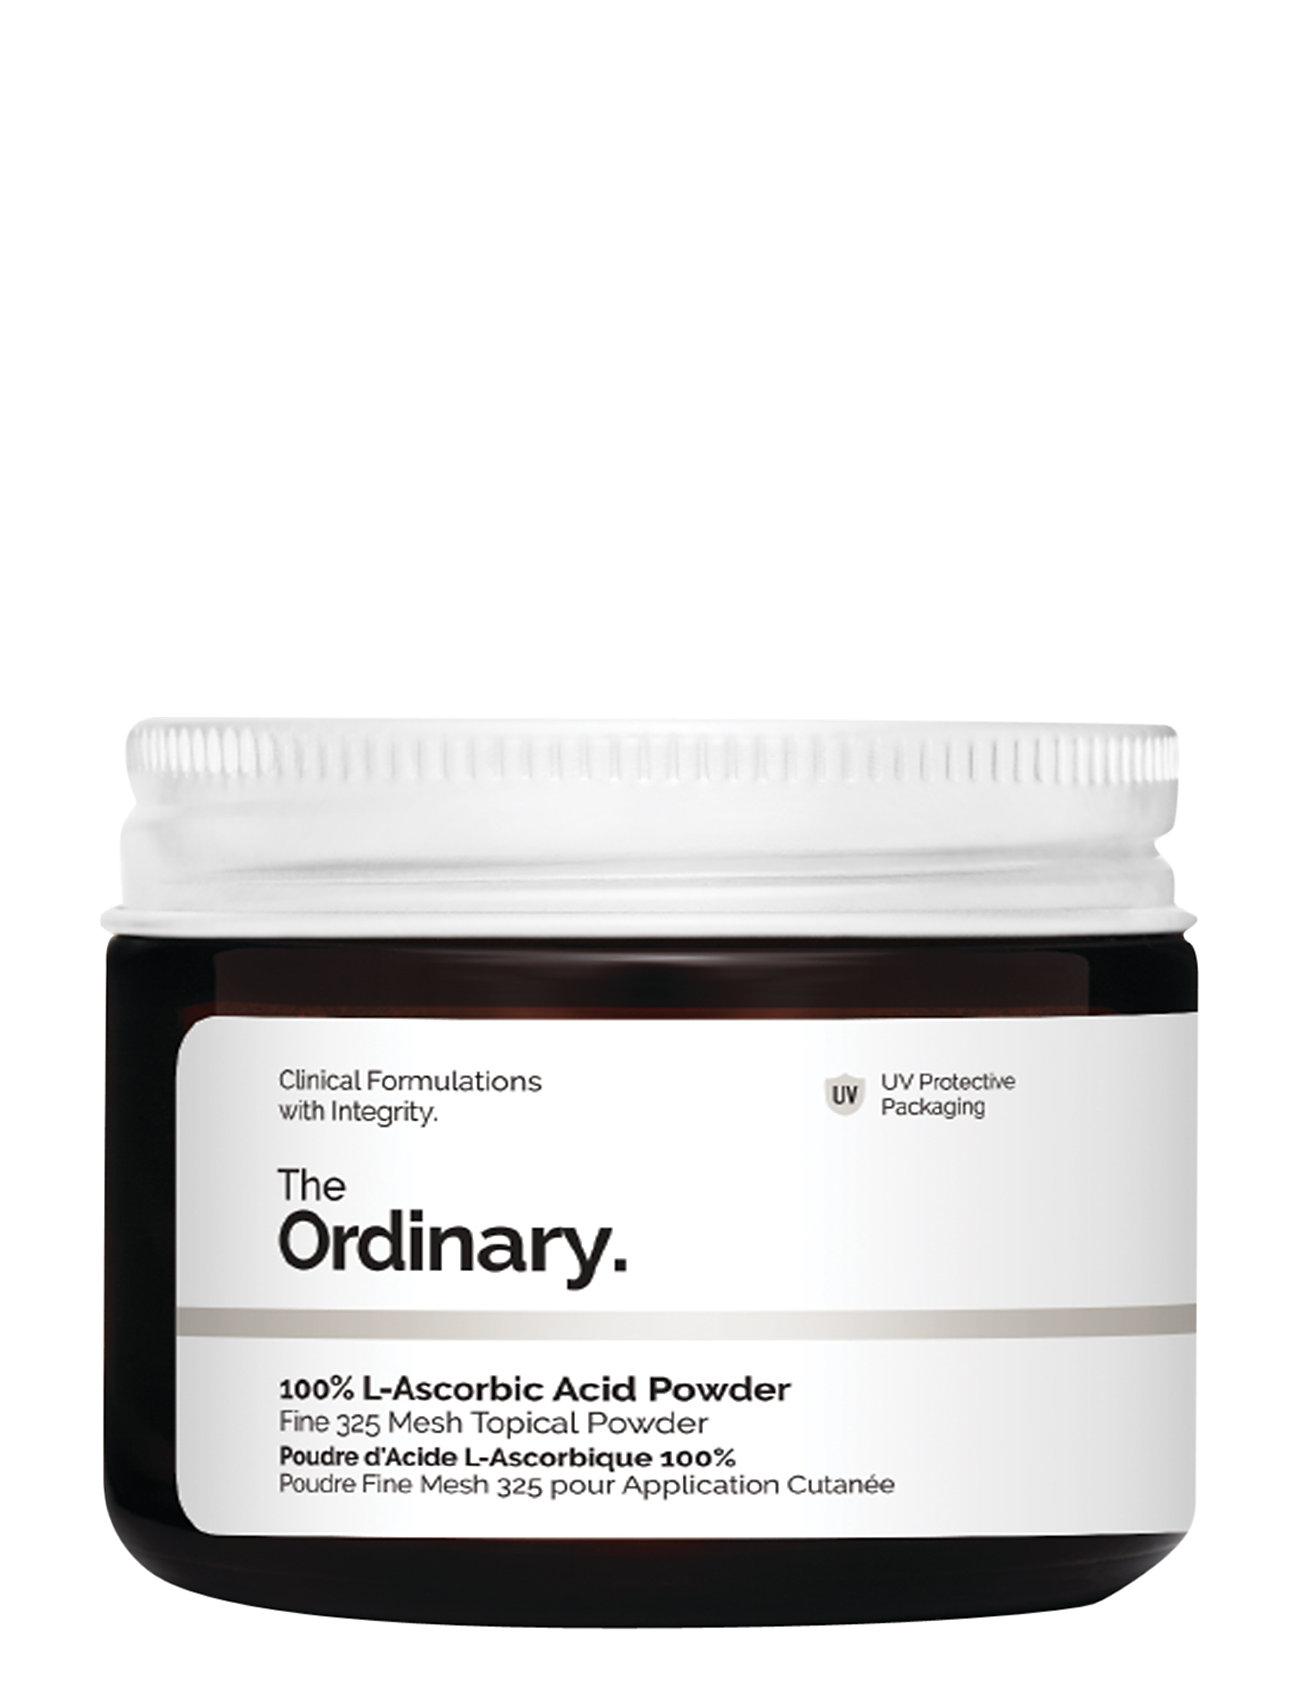 100% L-Ascorbic Acid Powder Beauty WOMEN Skin Care Face Day Creams Hvid The Ordinary